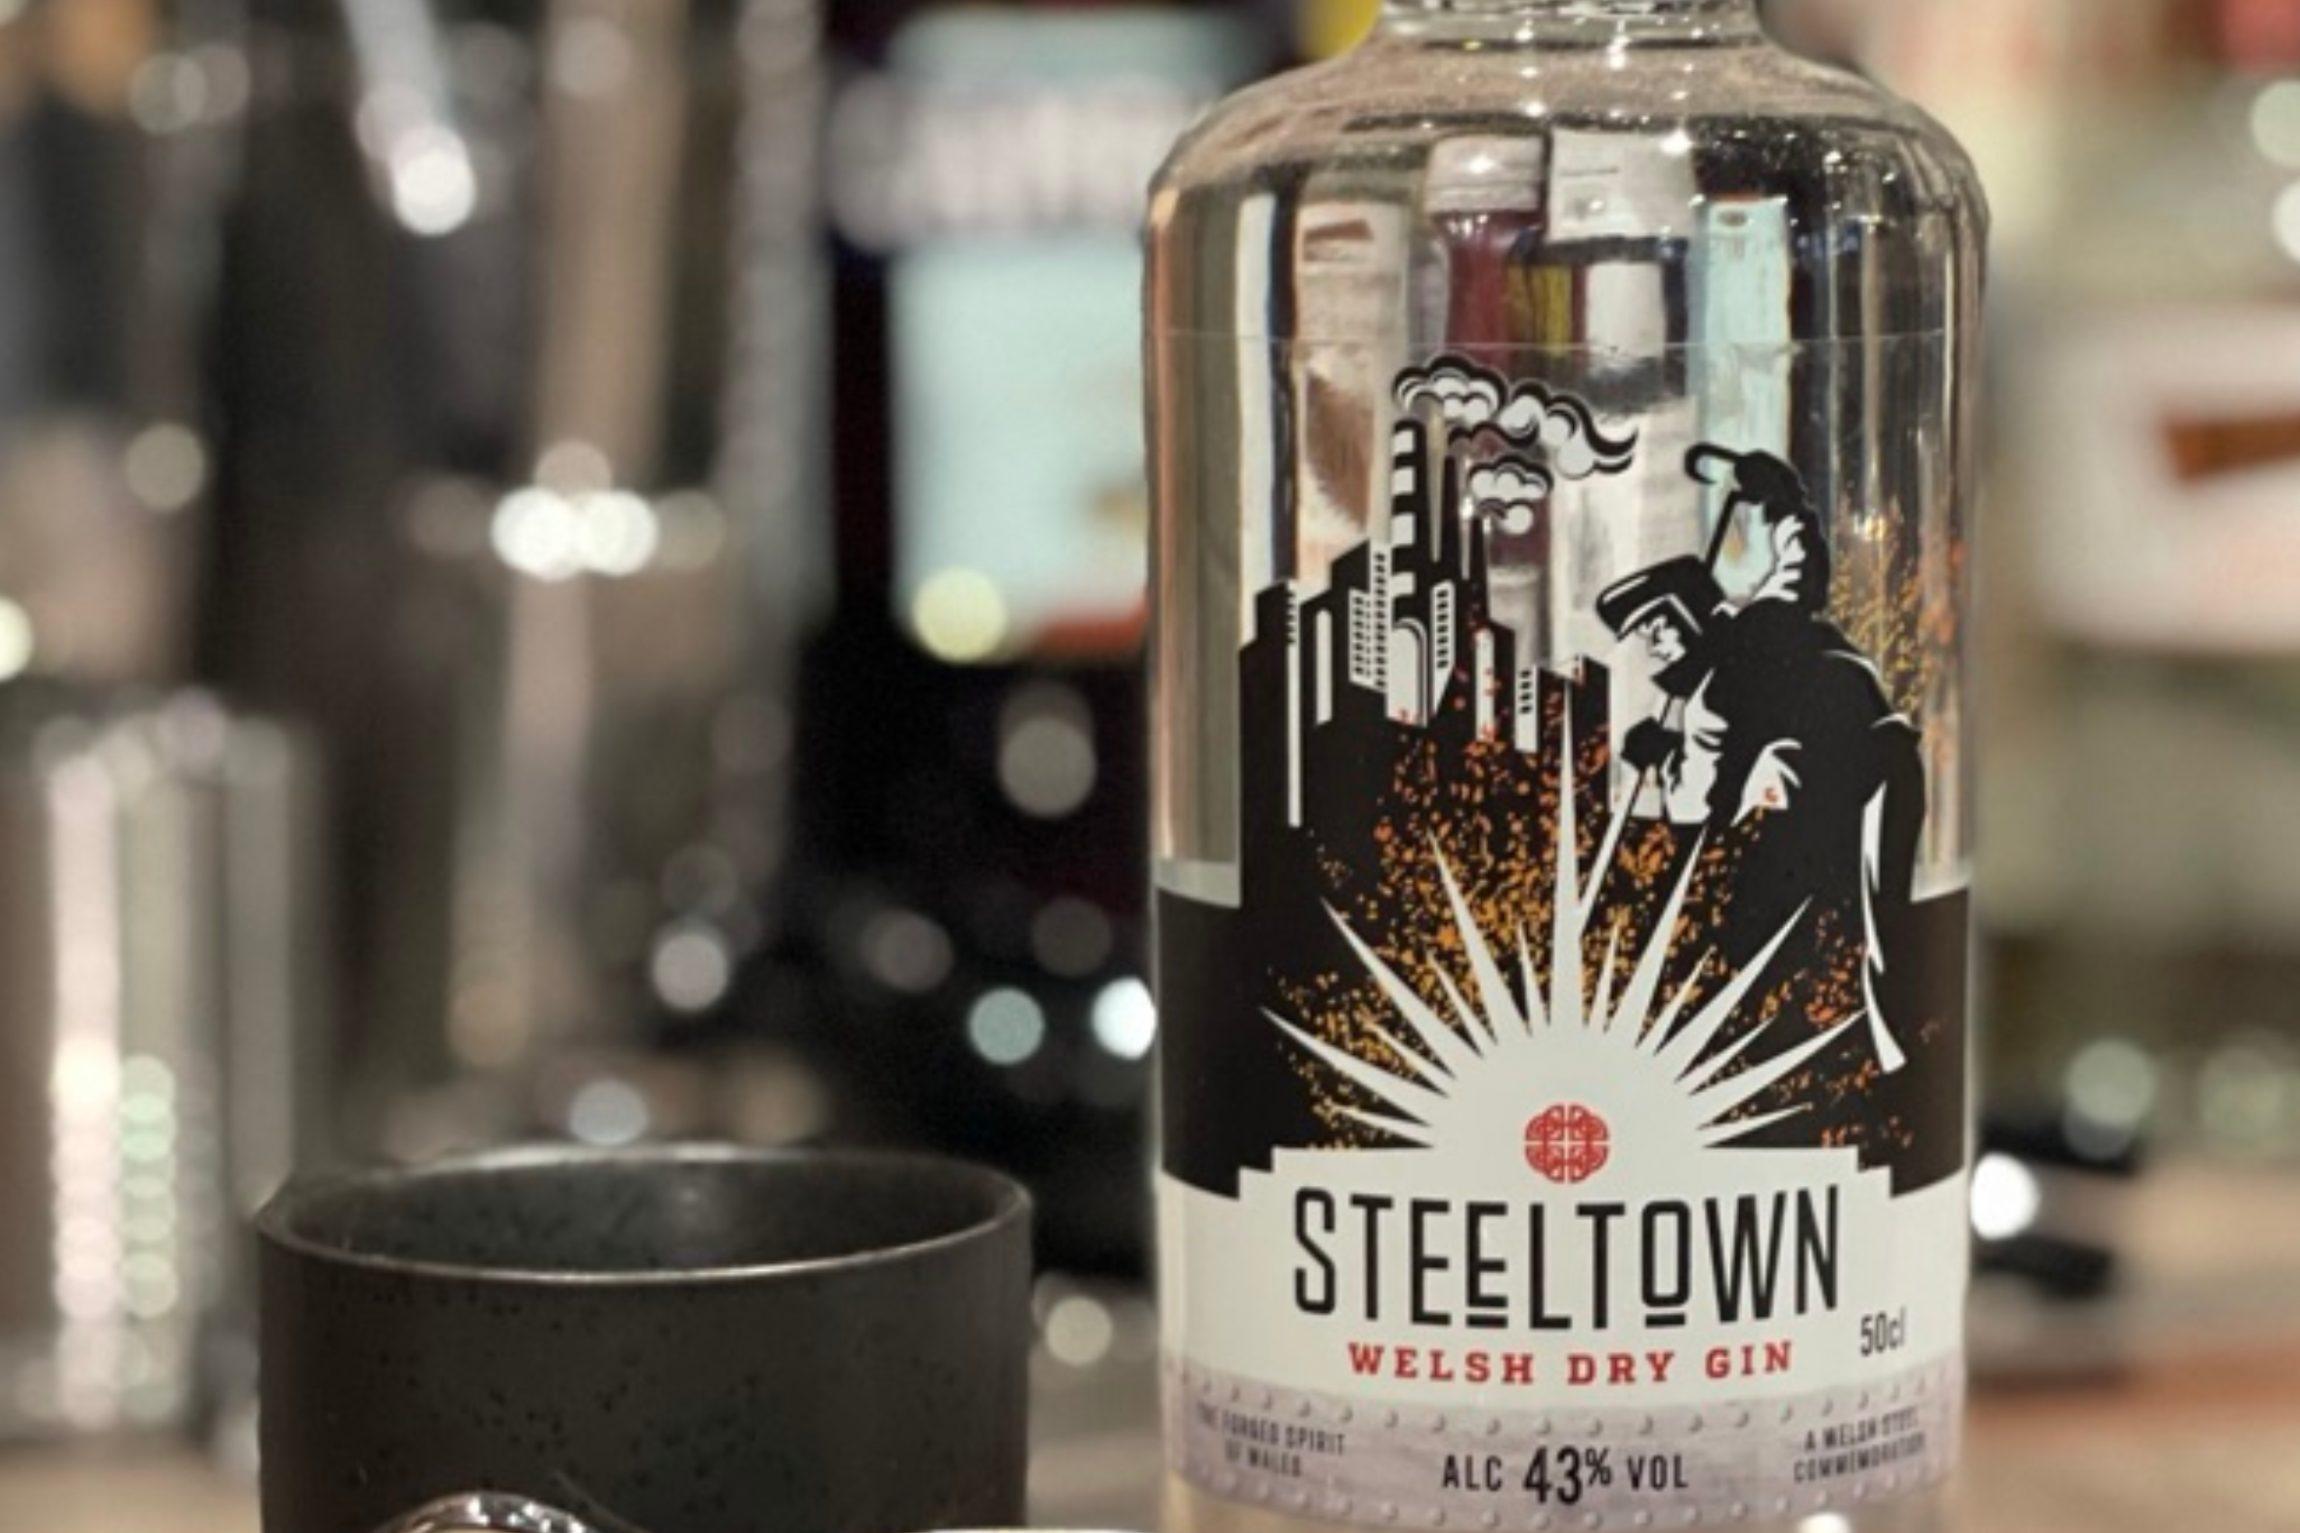 Spirit of Wales distillery introduces their award winning Steeltown Welsh Dry Gin